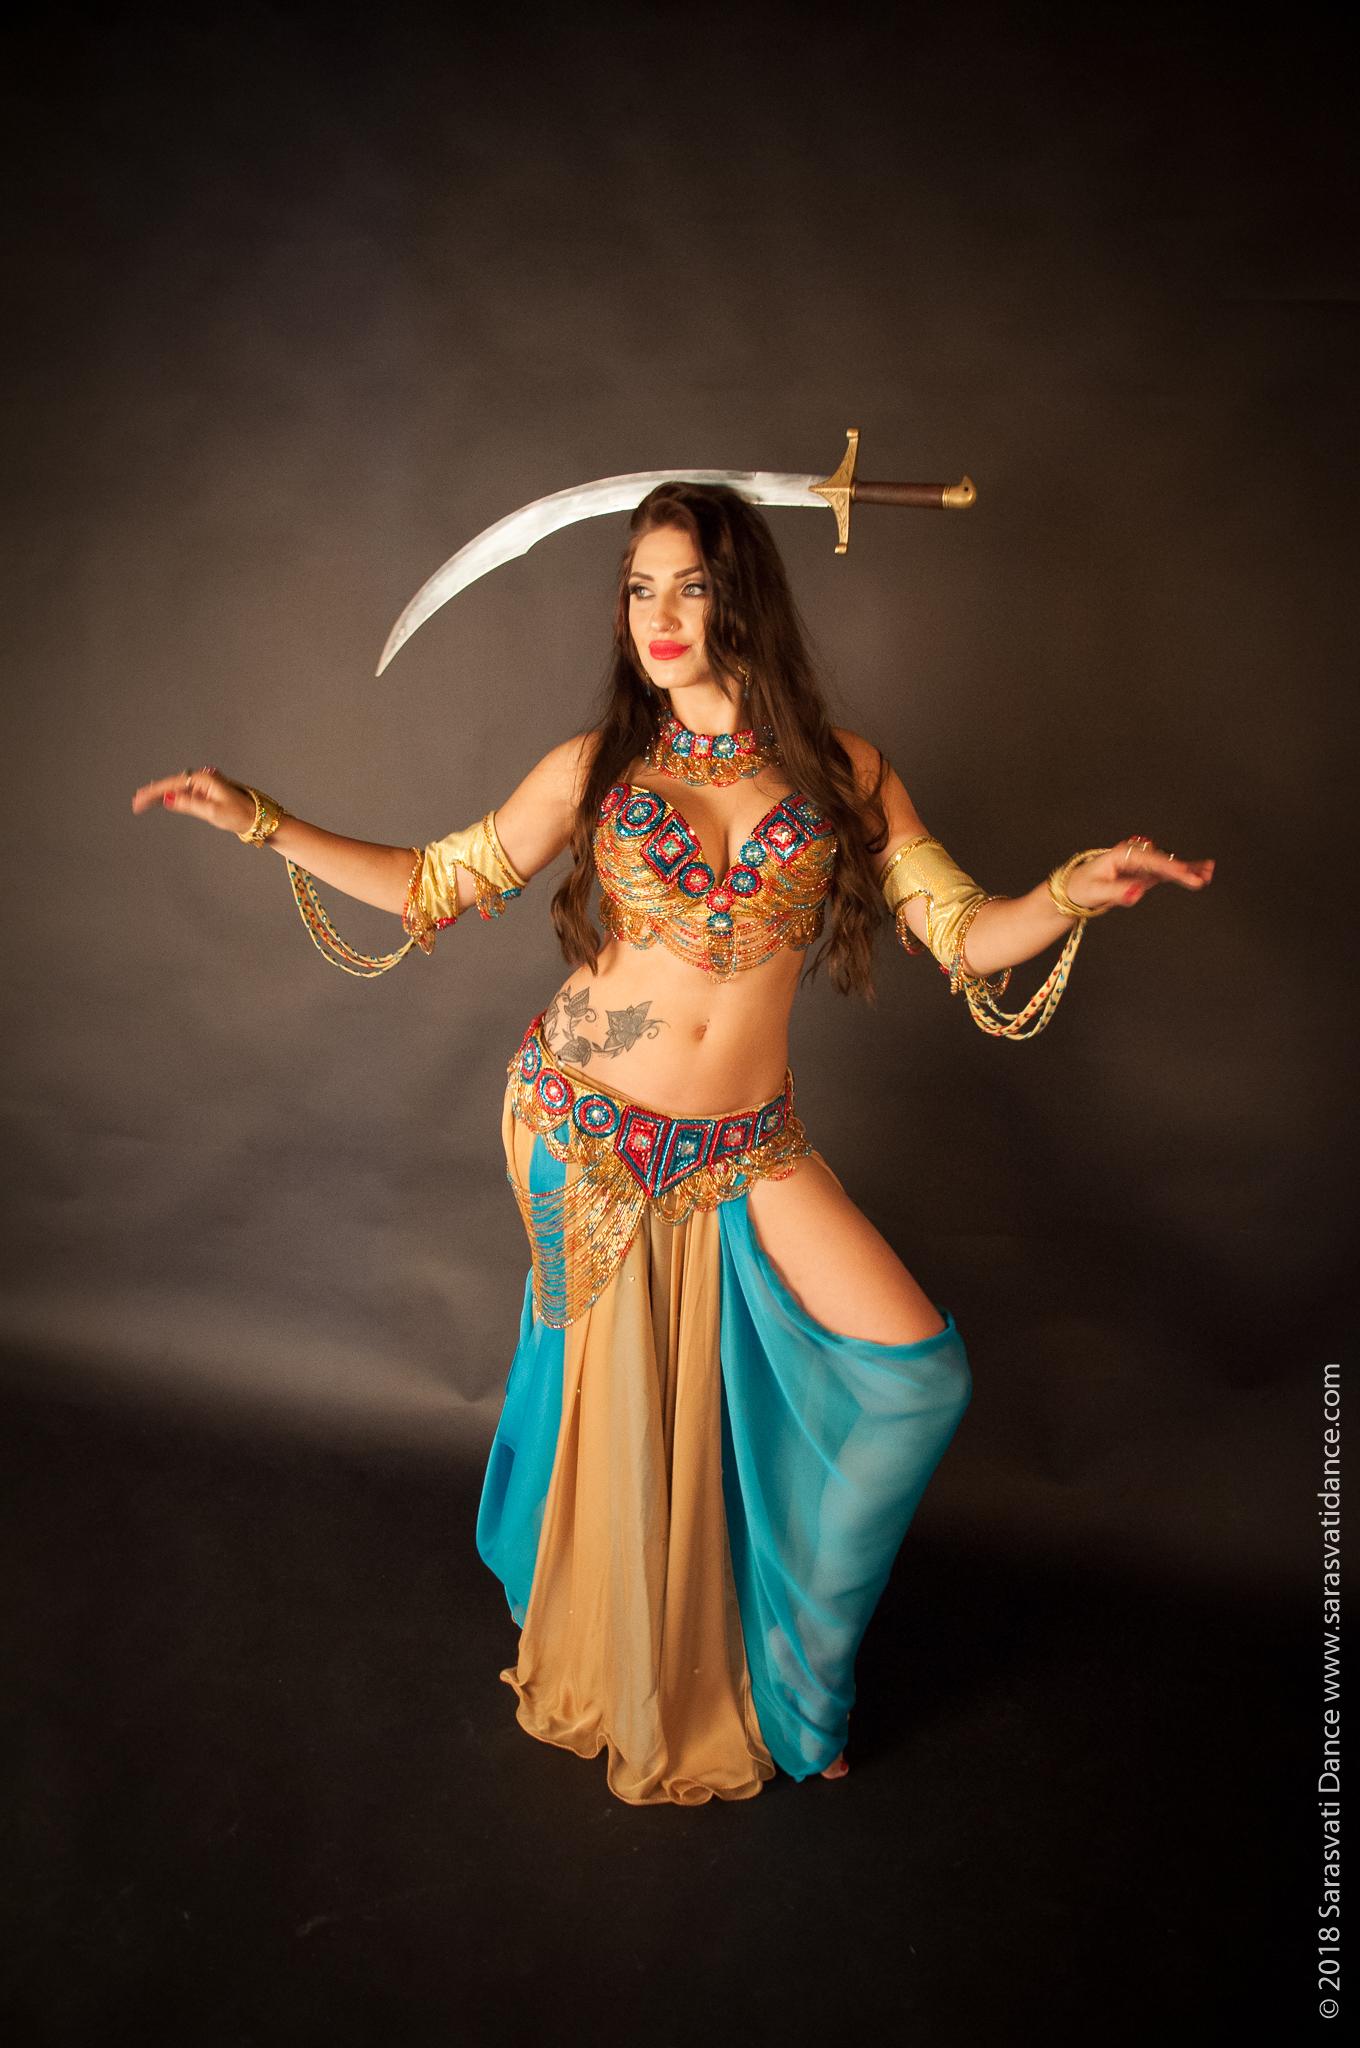 Private Belly Dance Class by Sarasvati Dance - dance in London